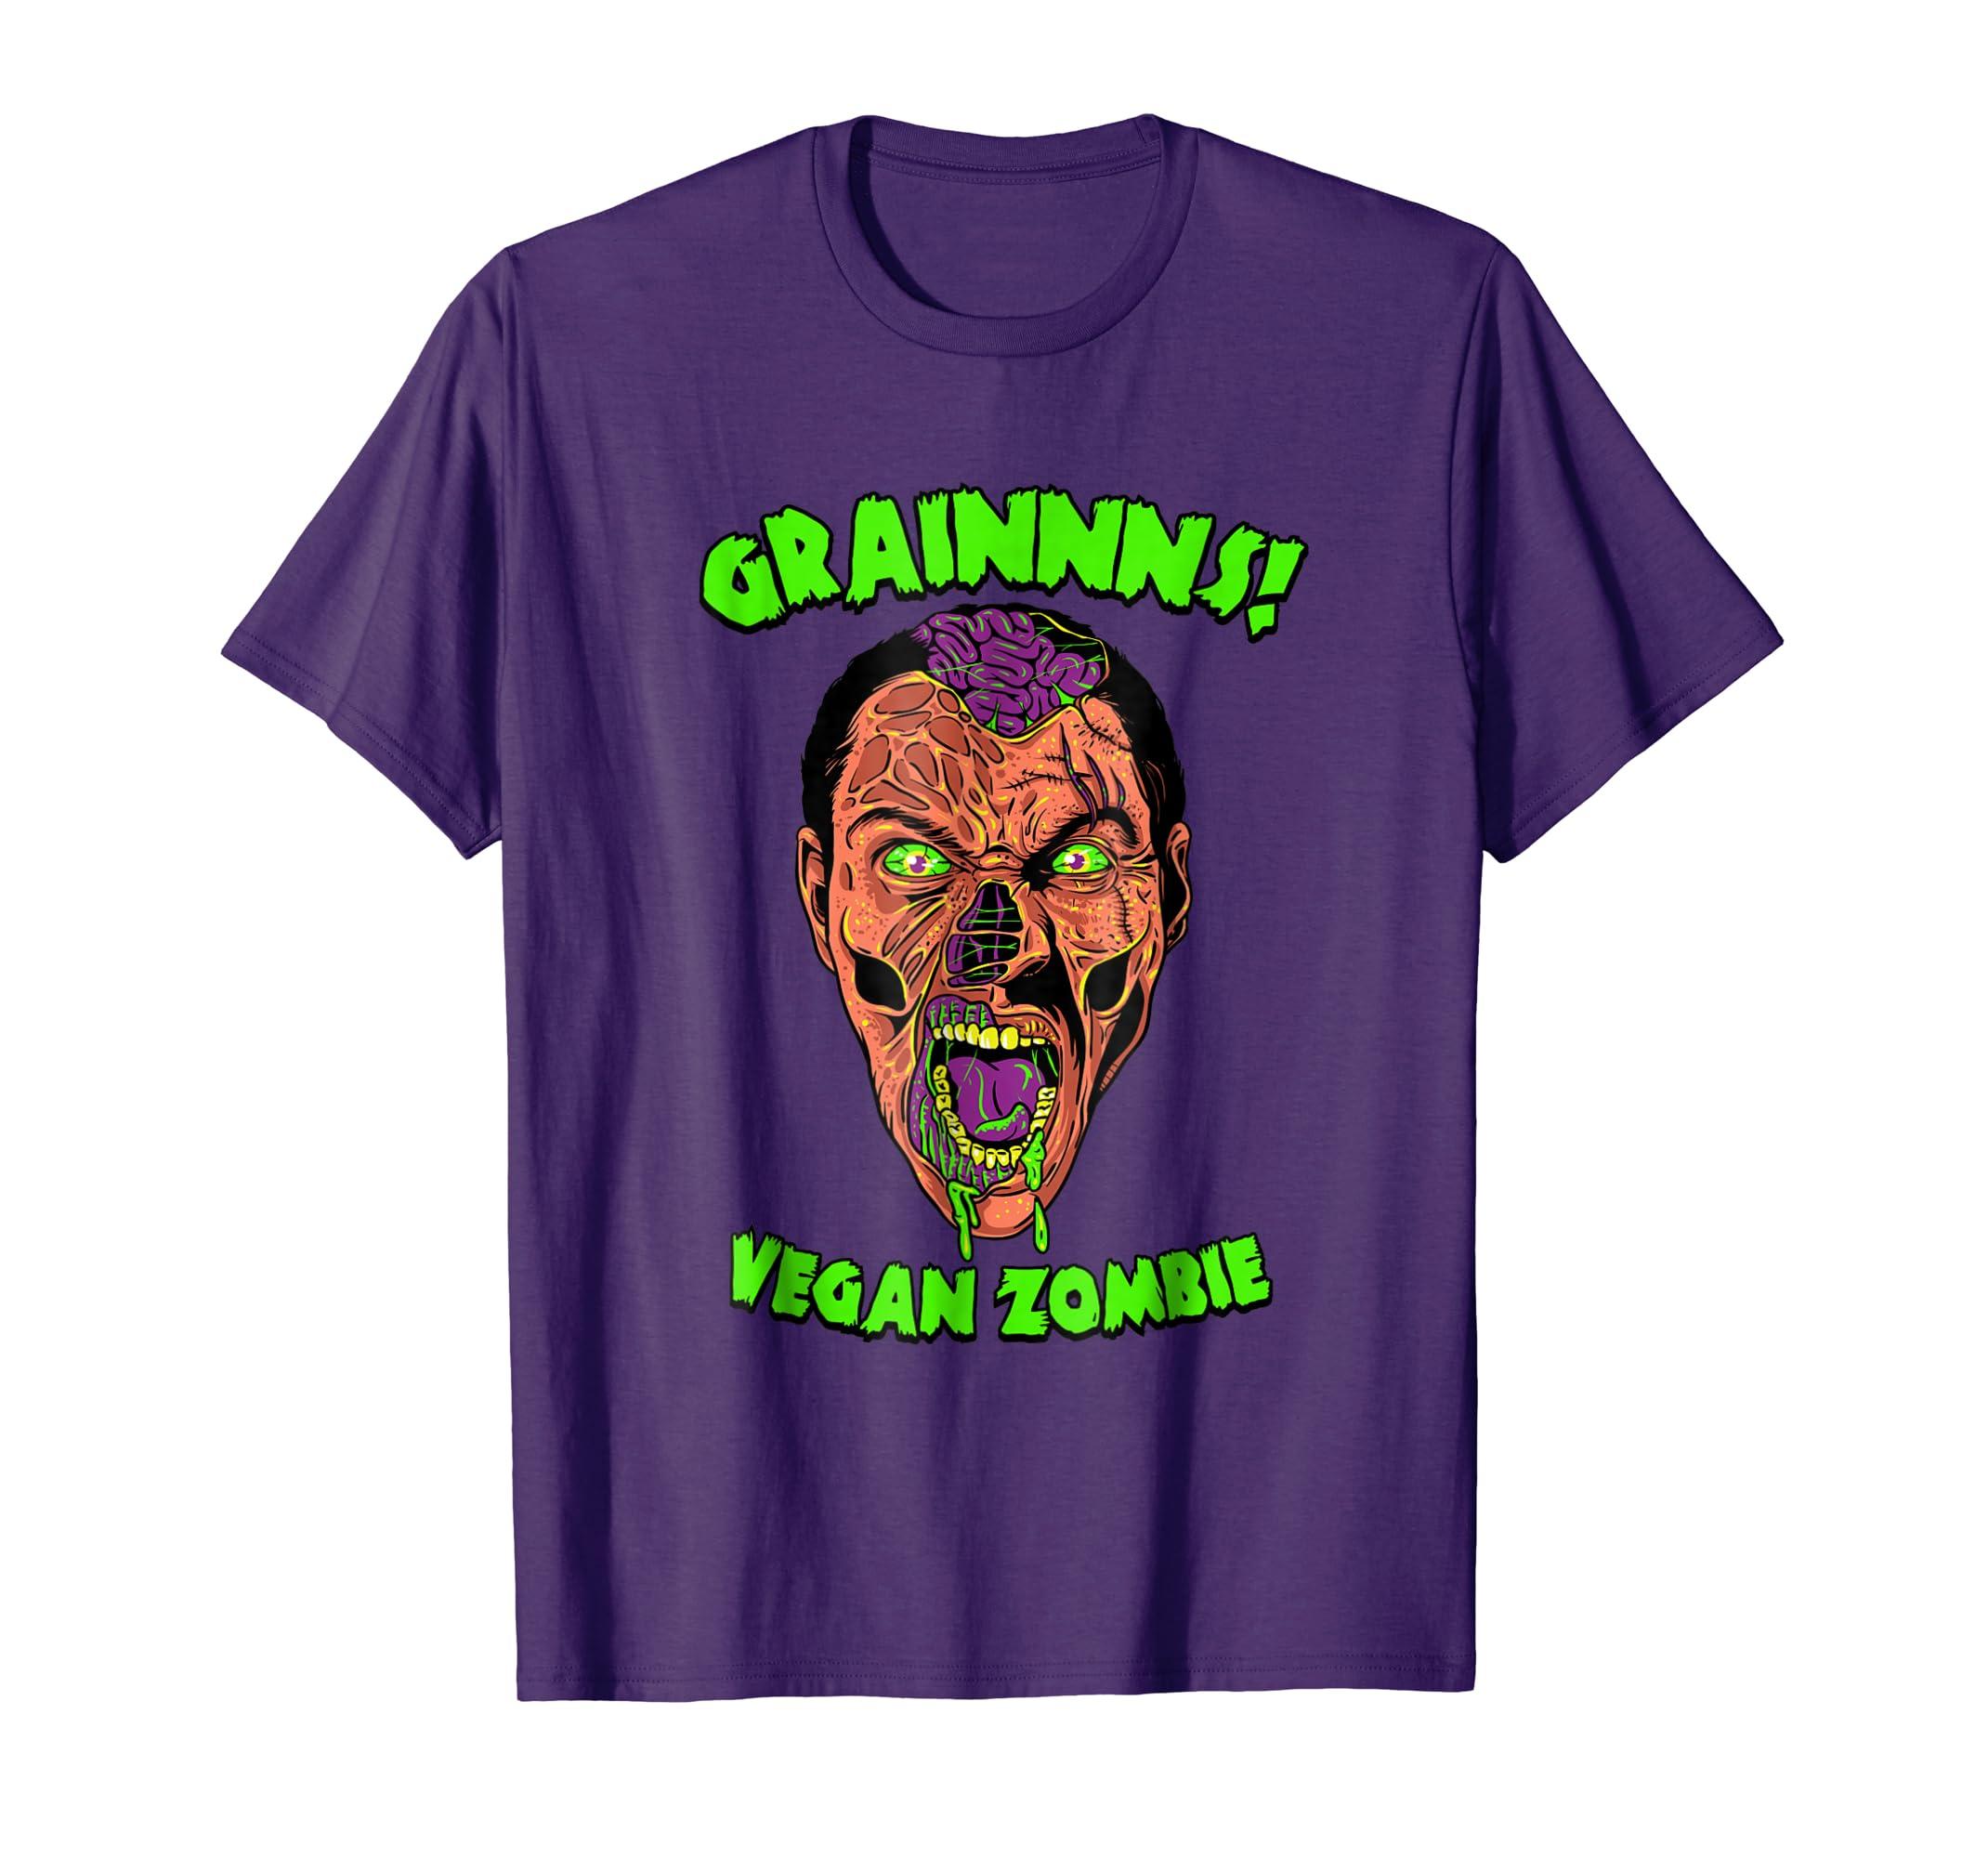 Vegan Zombie T-Shirt - Funny Living Dead Halloween Shirt Vegan Zombie Shirts